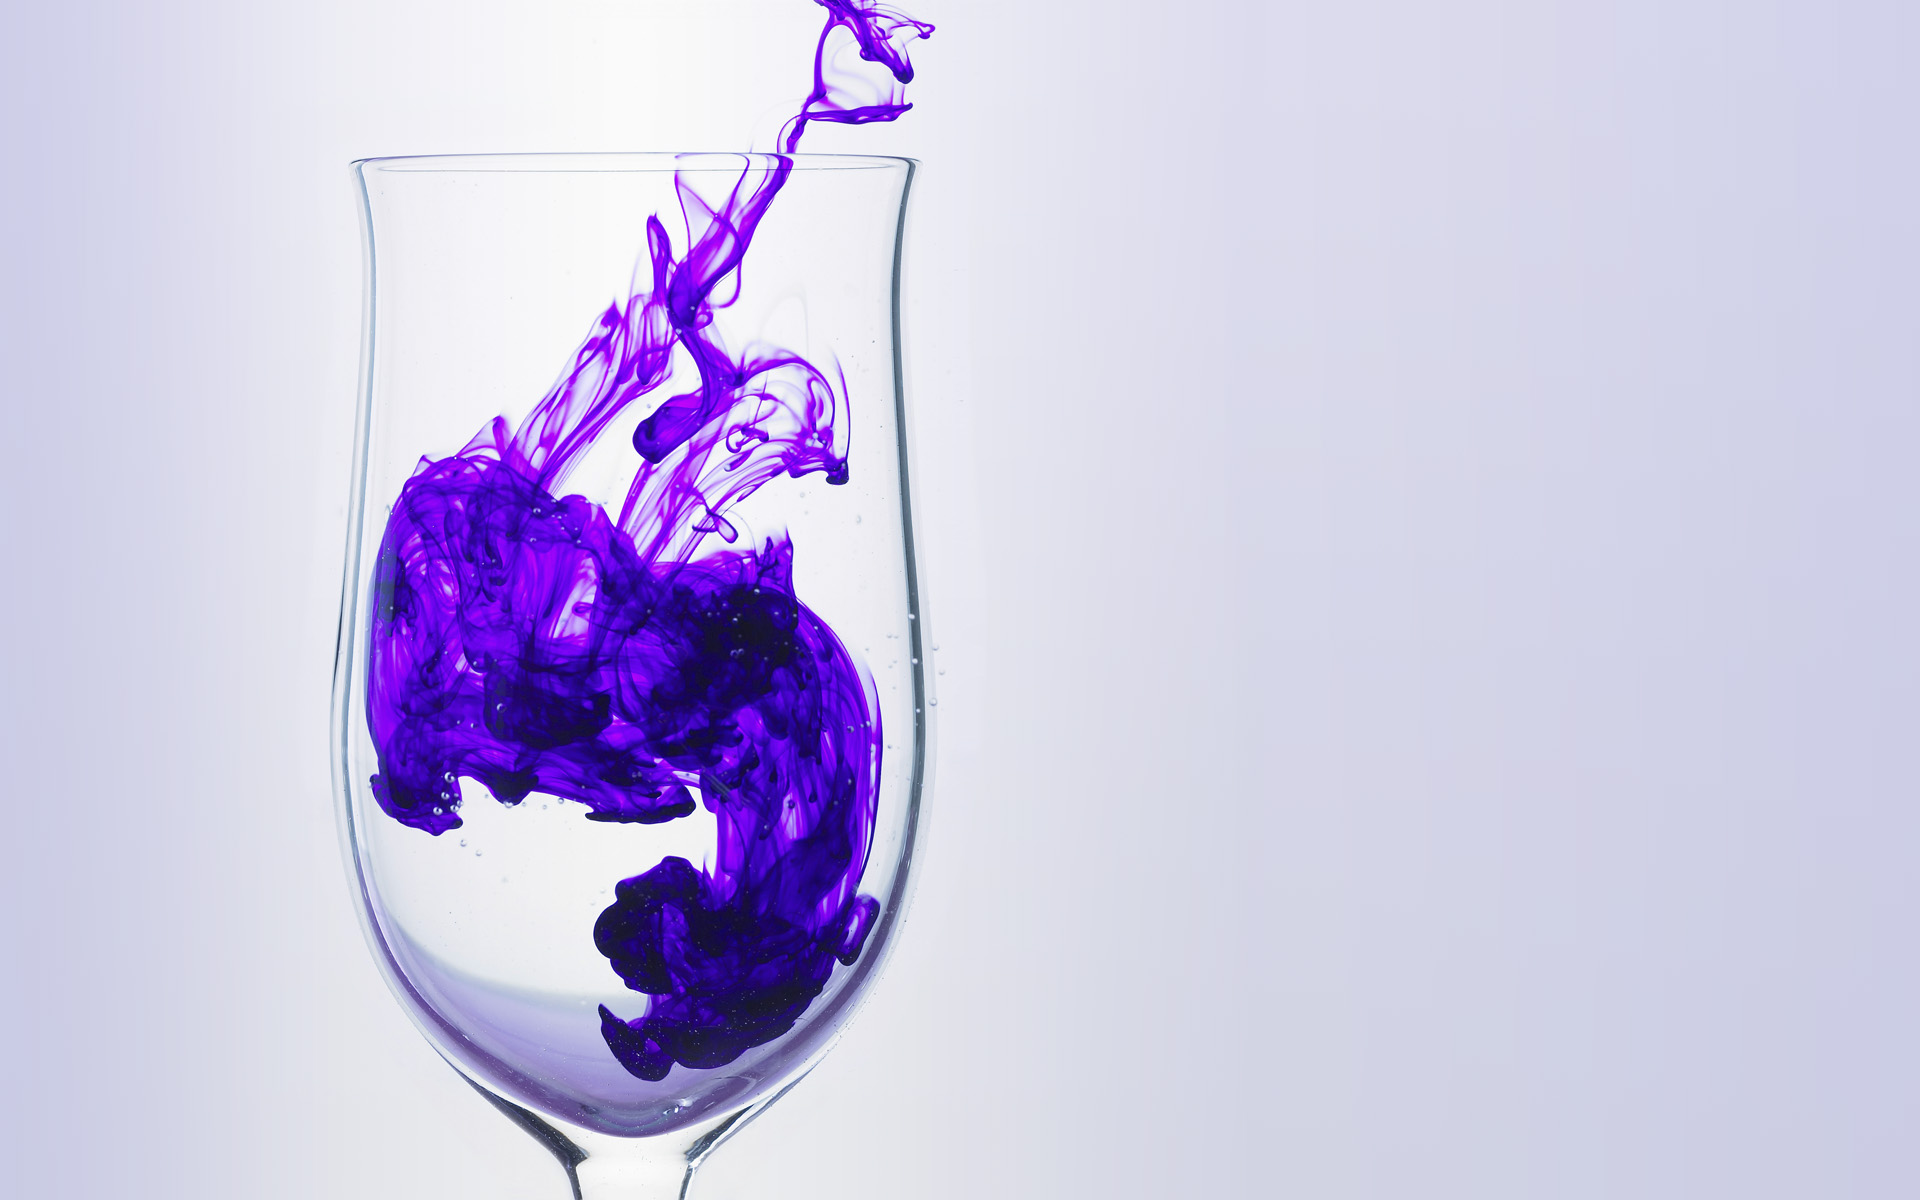 Desktop Wallpapers Hd Abstract Wallpapers Ink In Water